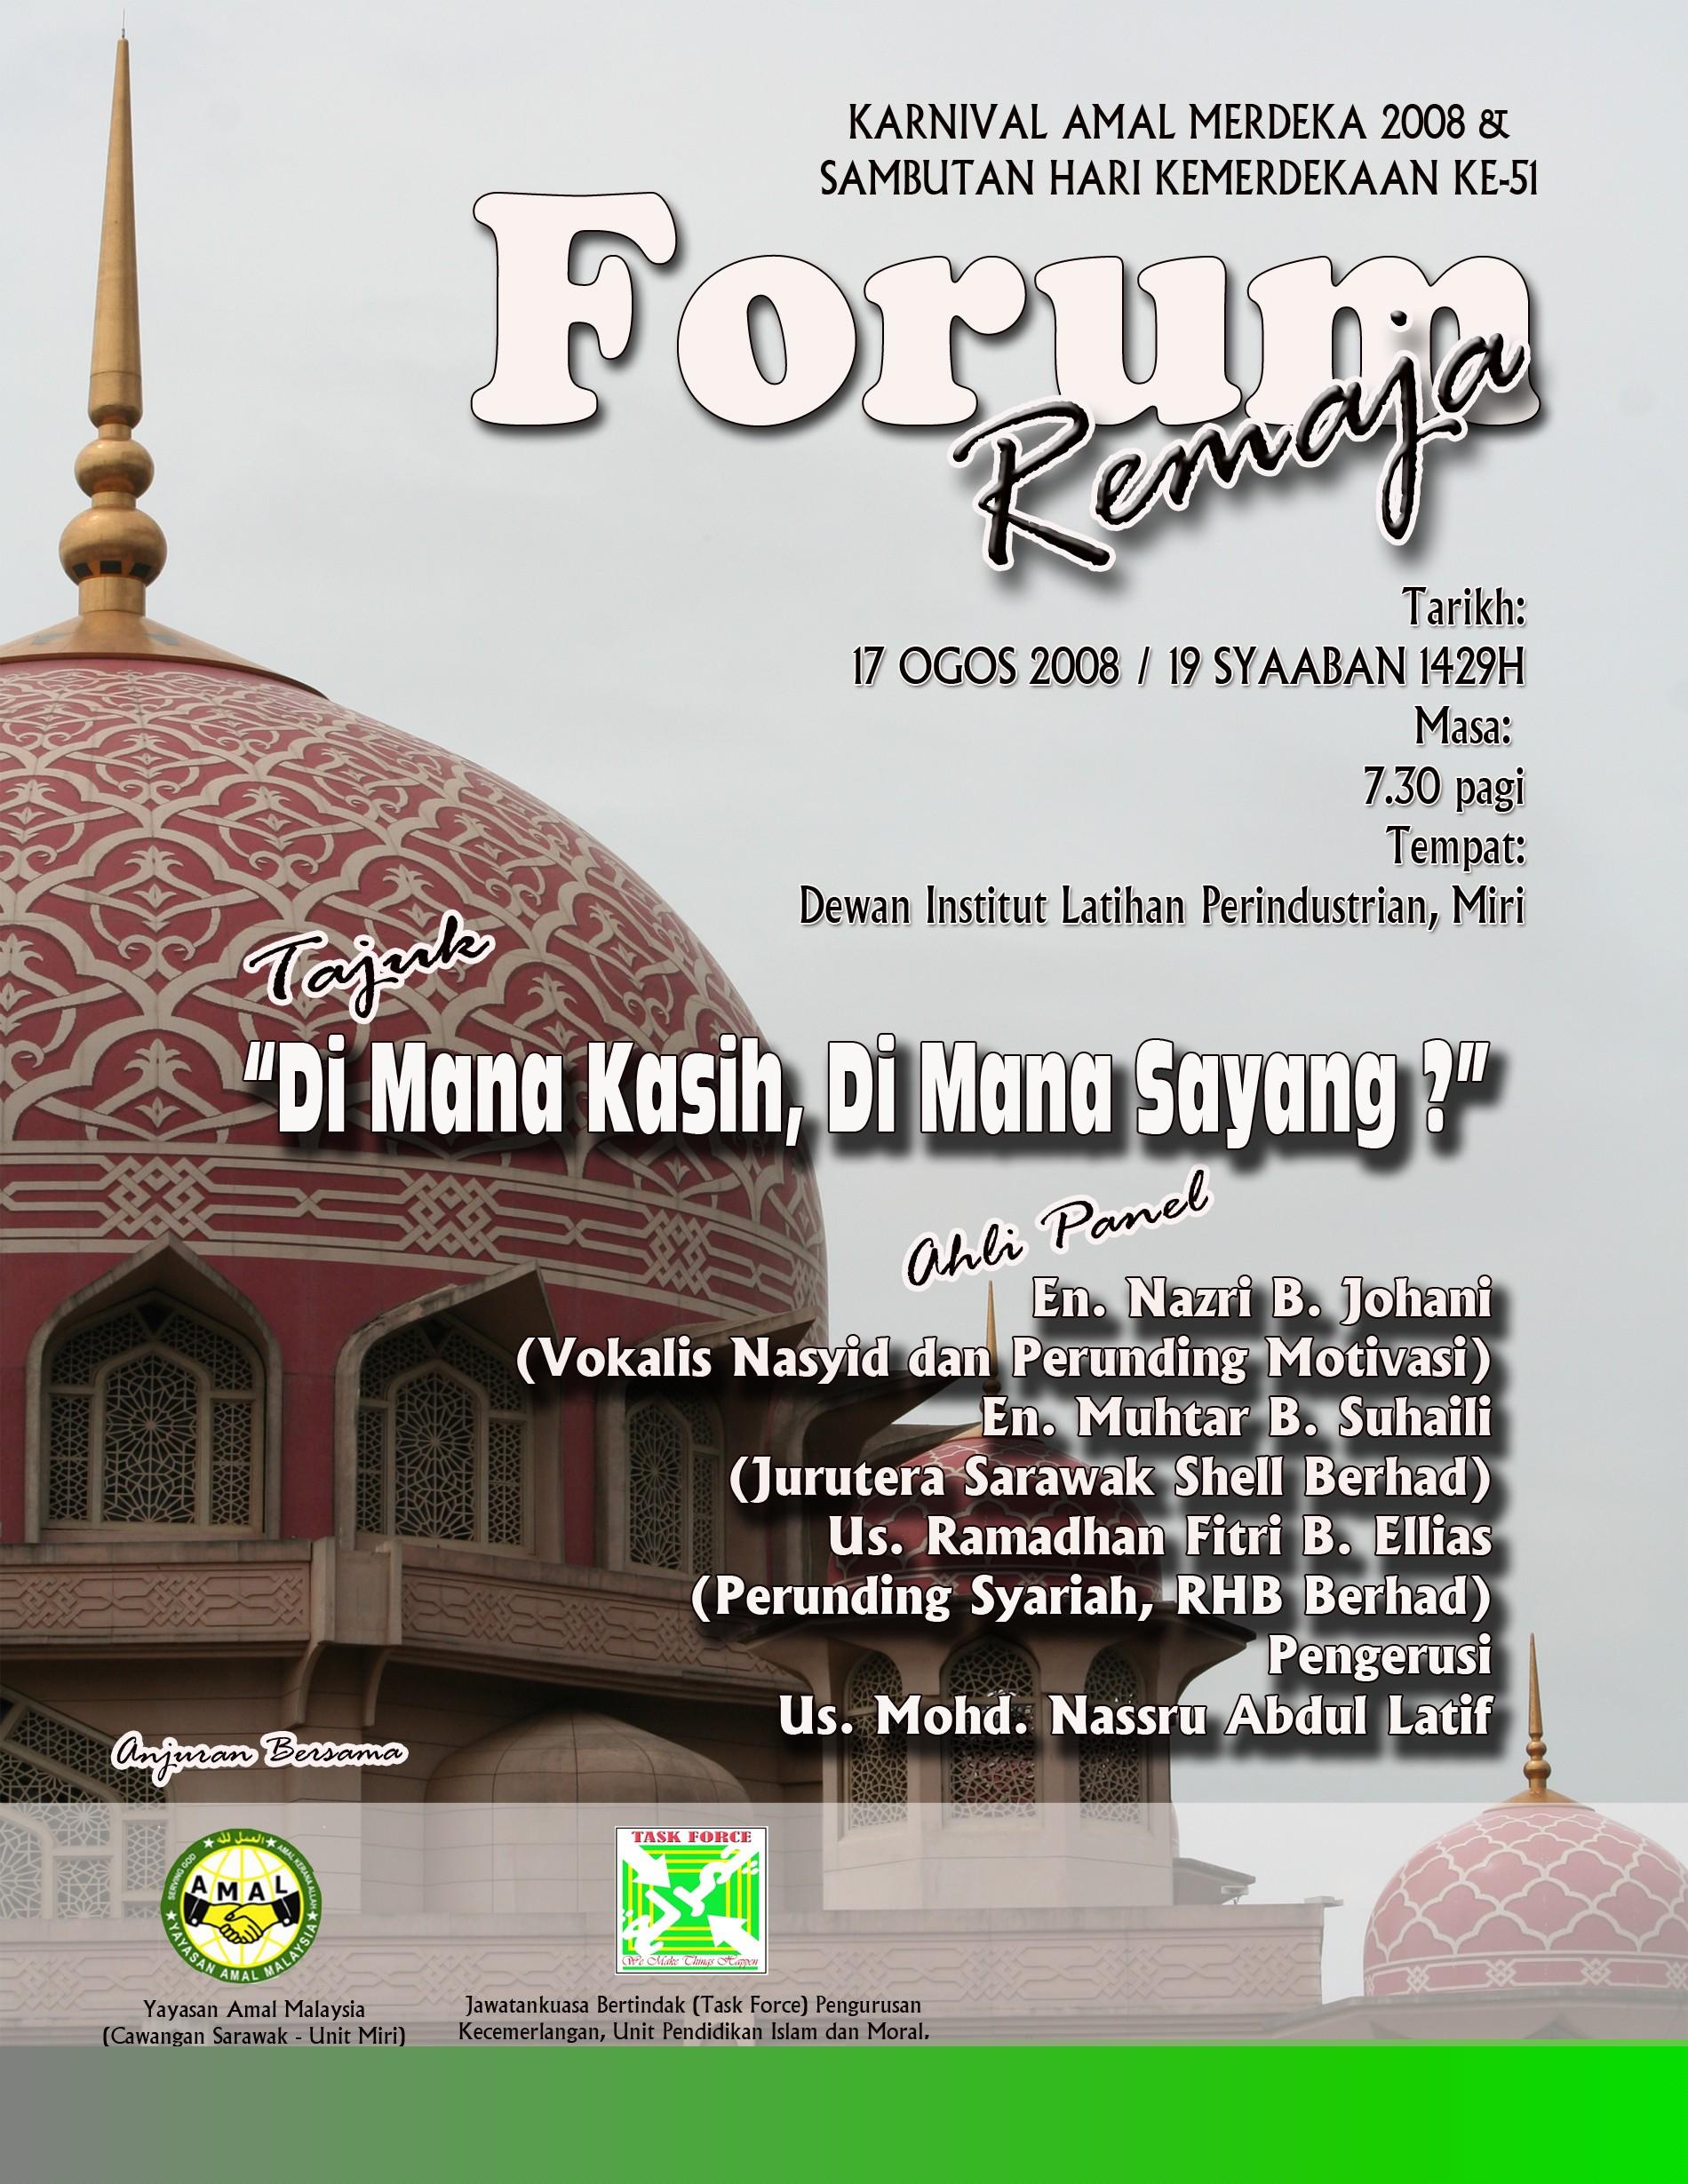 Forum Remaja Sempena Karnival 'Amal Merdeka 2008 Julai 10, 2008